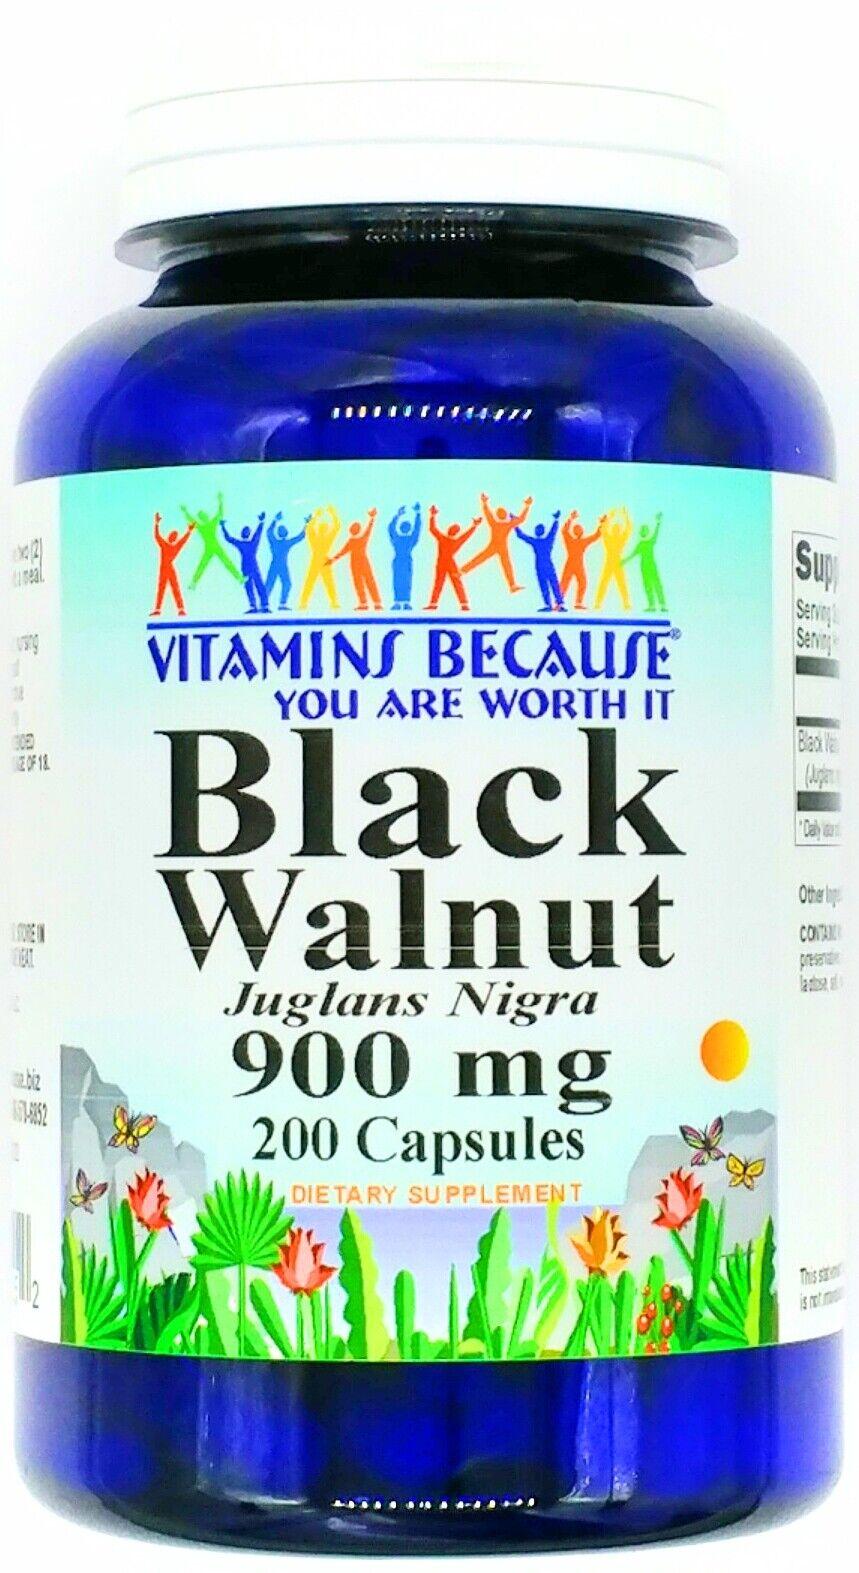 200 Capsules 900mg Black Walnut Hull Herbal Parasite Bacteria Cleanse VB